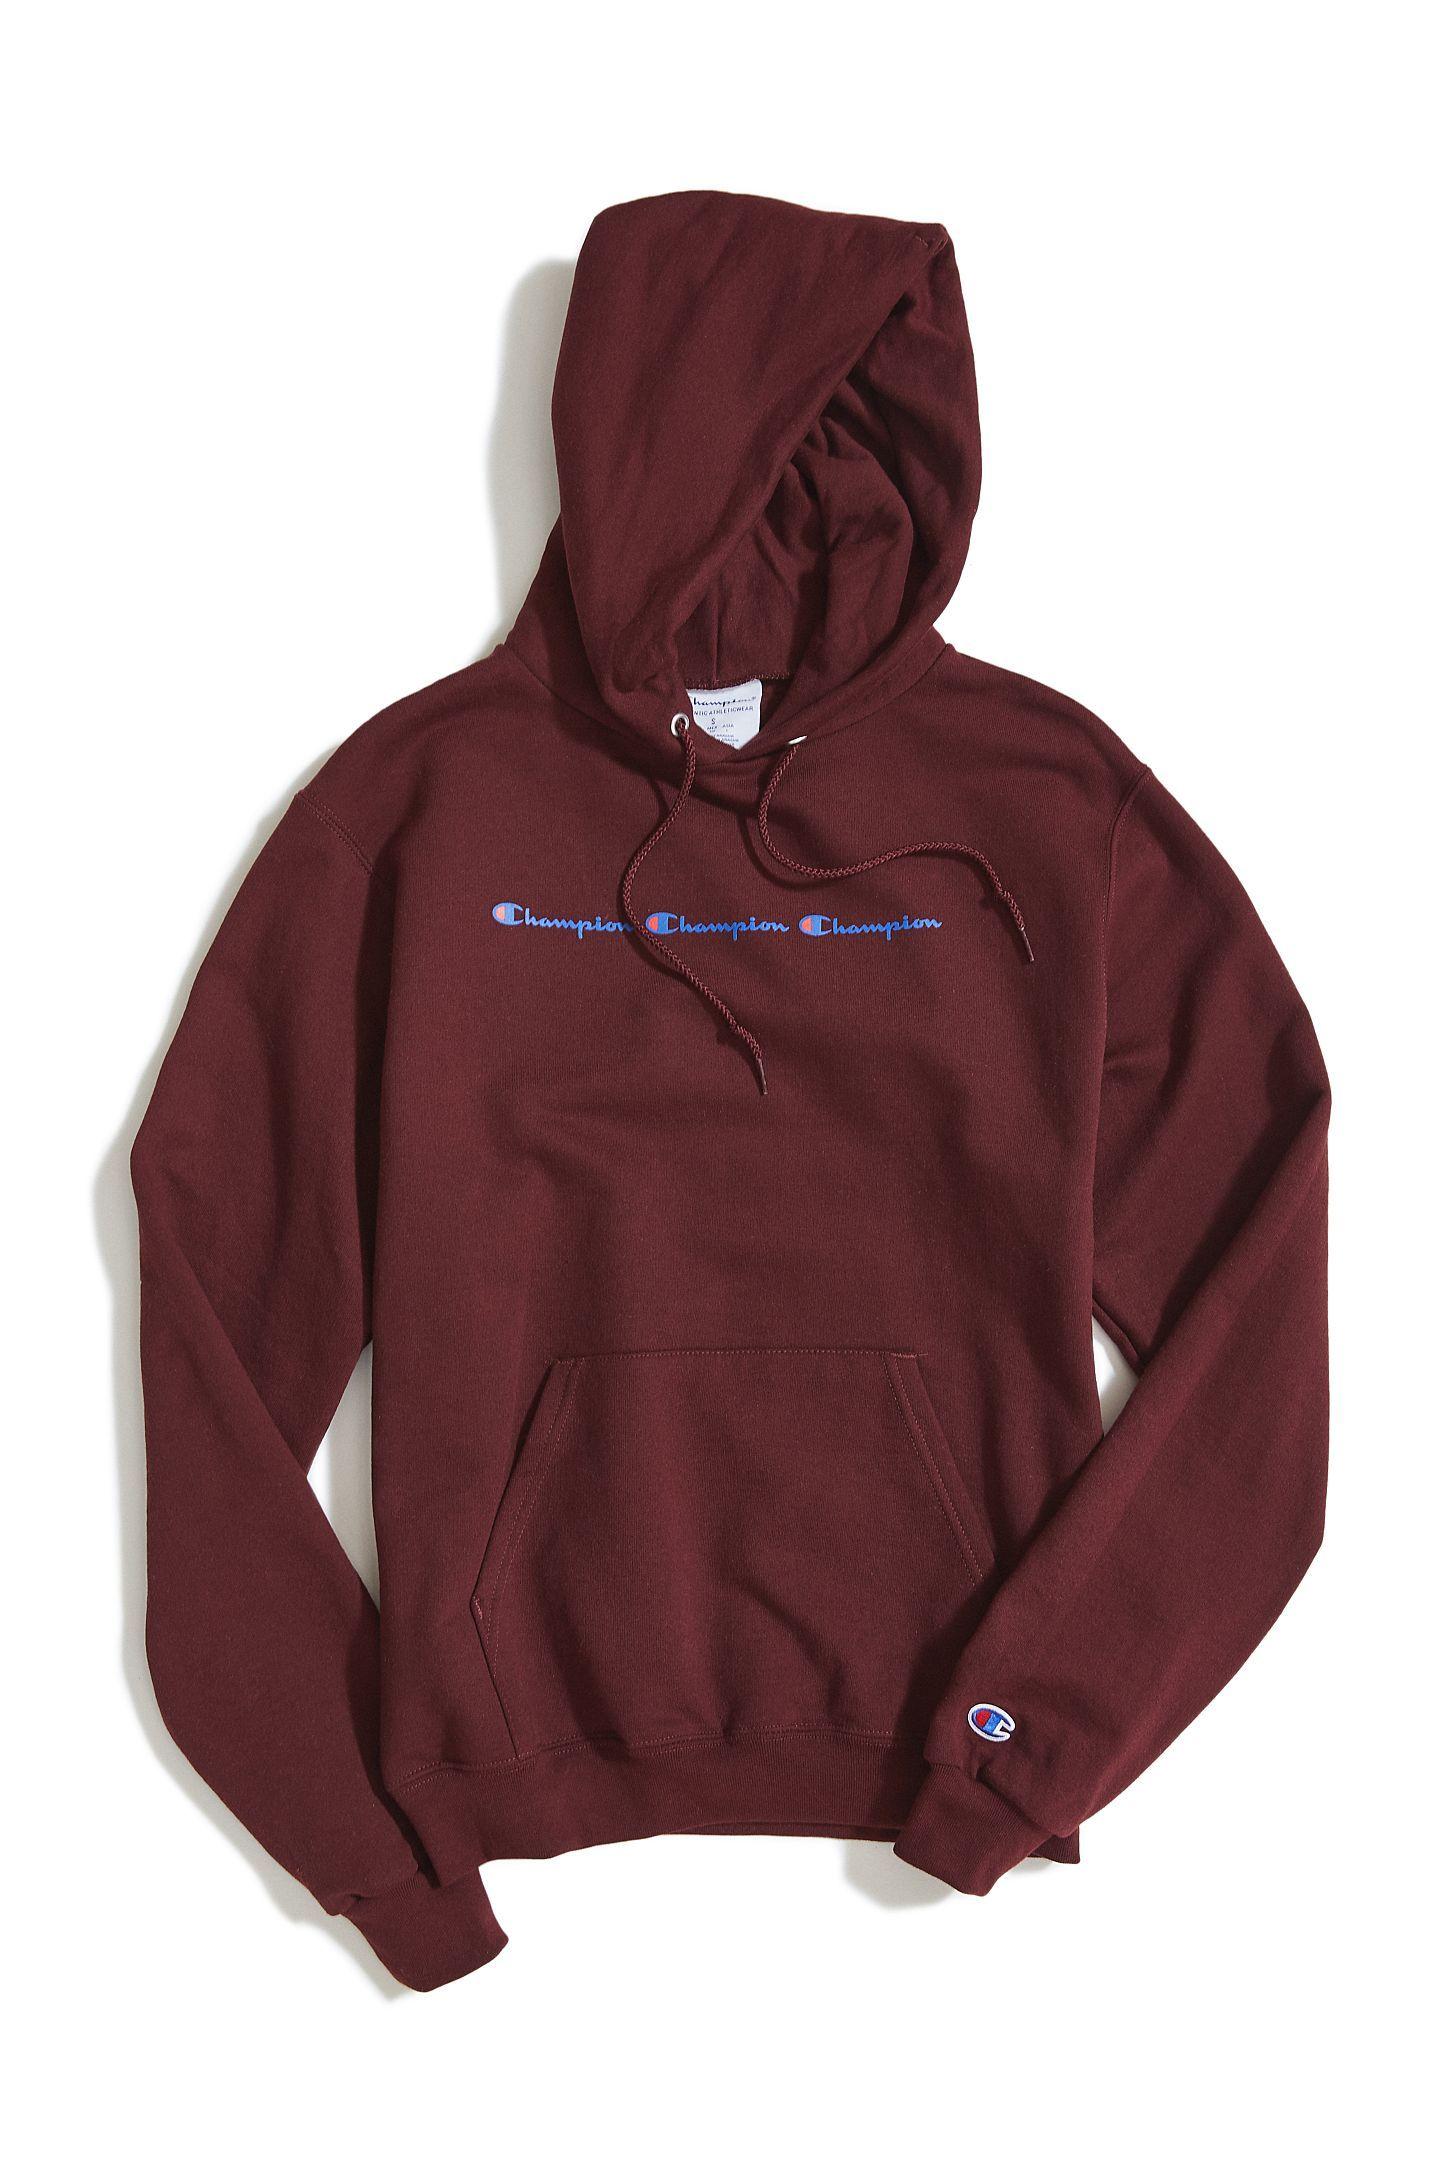 Champion Eco Triple Script Hoodie Sweatshirt Urban Outfitters Sweatshirts Hoodie Hoodies Sweatshirts [ 2175 x 1450 Pixel ]